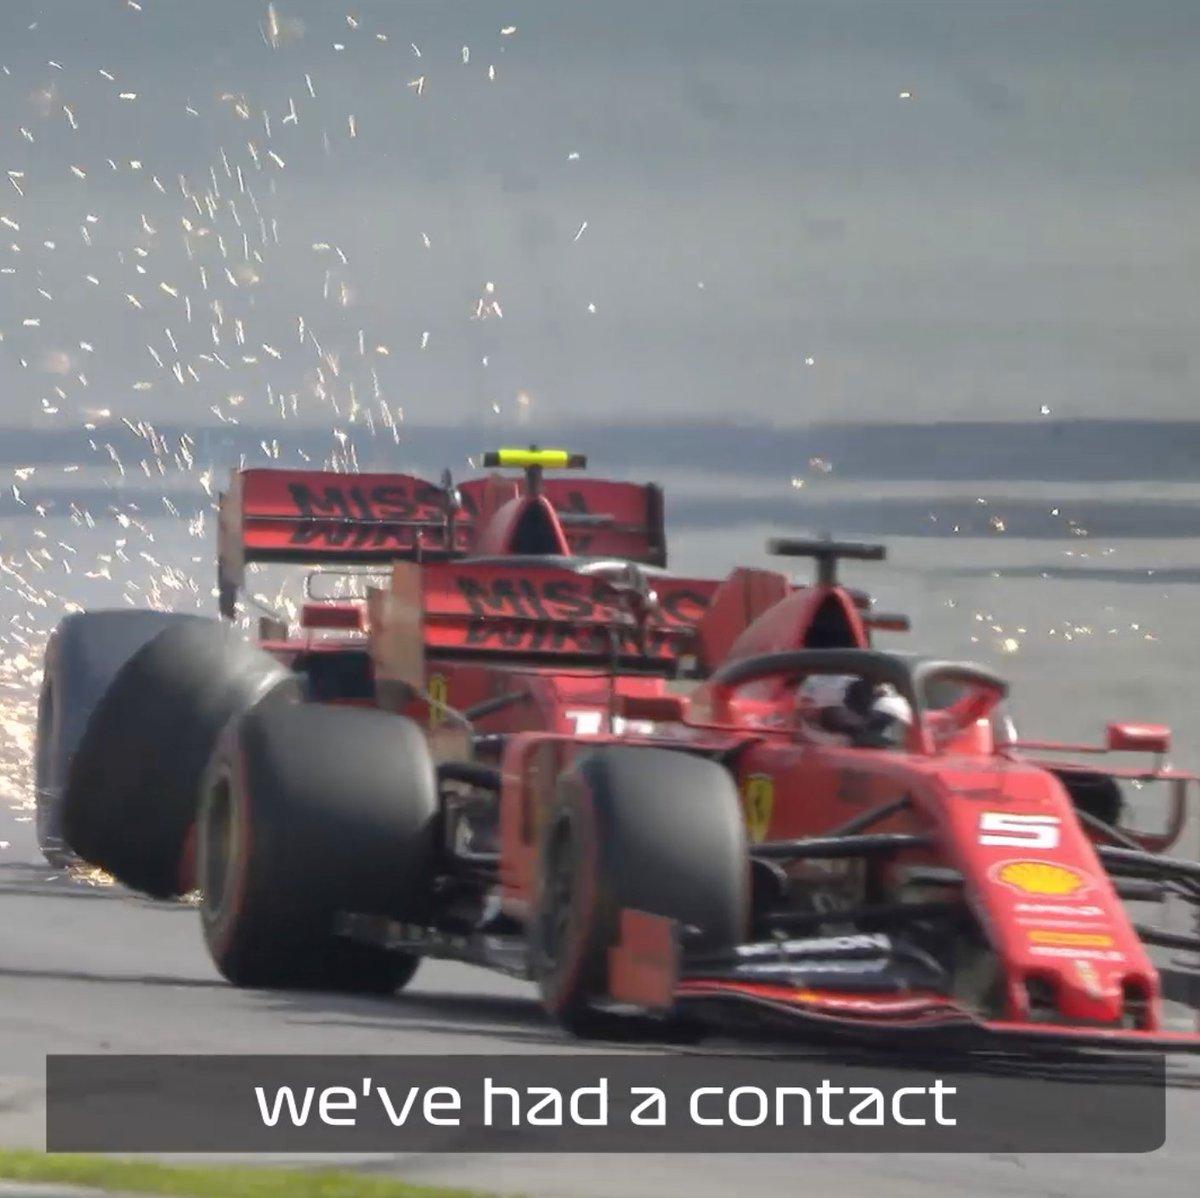 Both sides of the Ferrari story...  #BrazilGP 🇧🇷 #F1